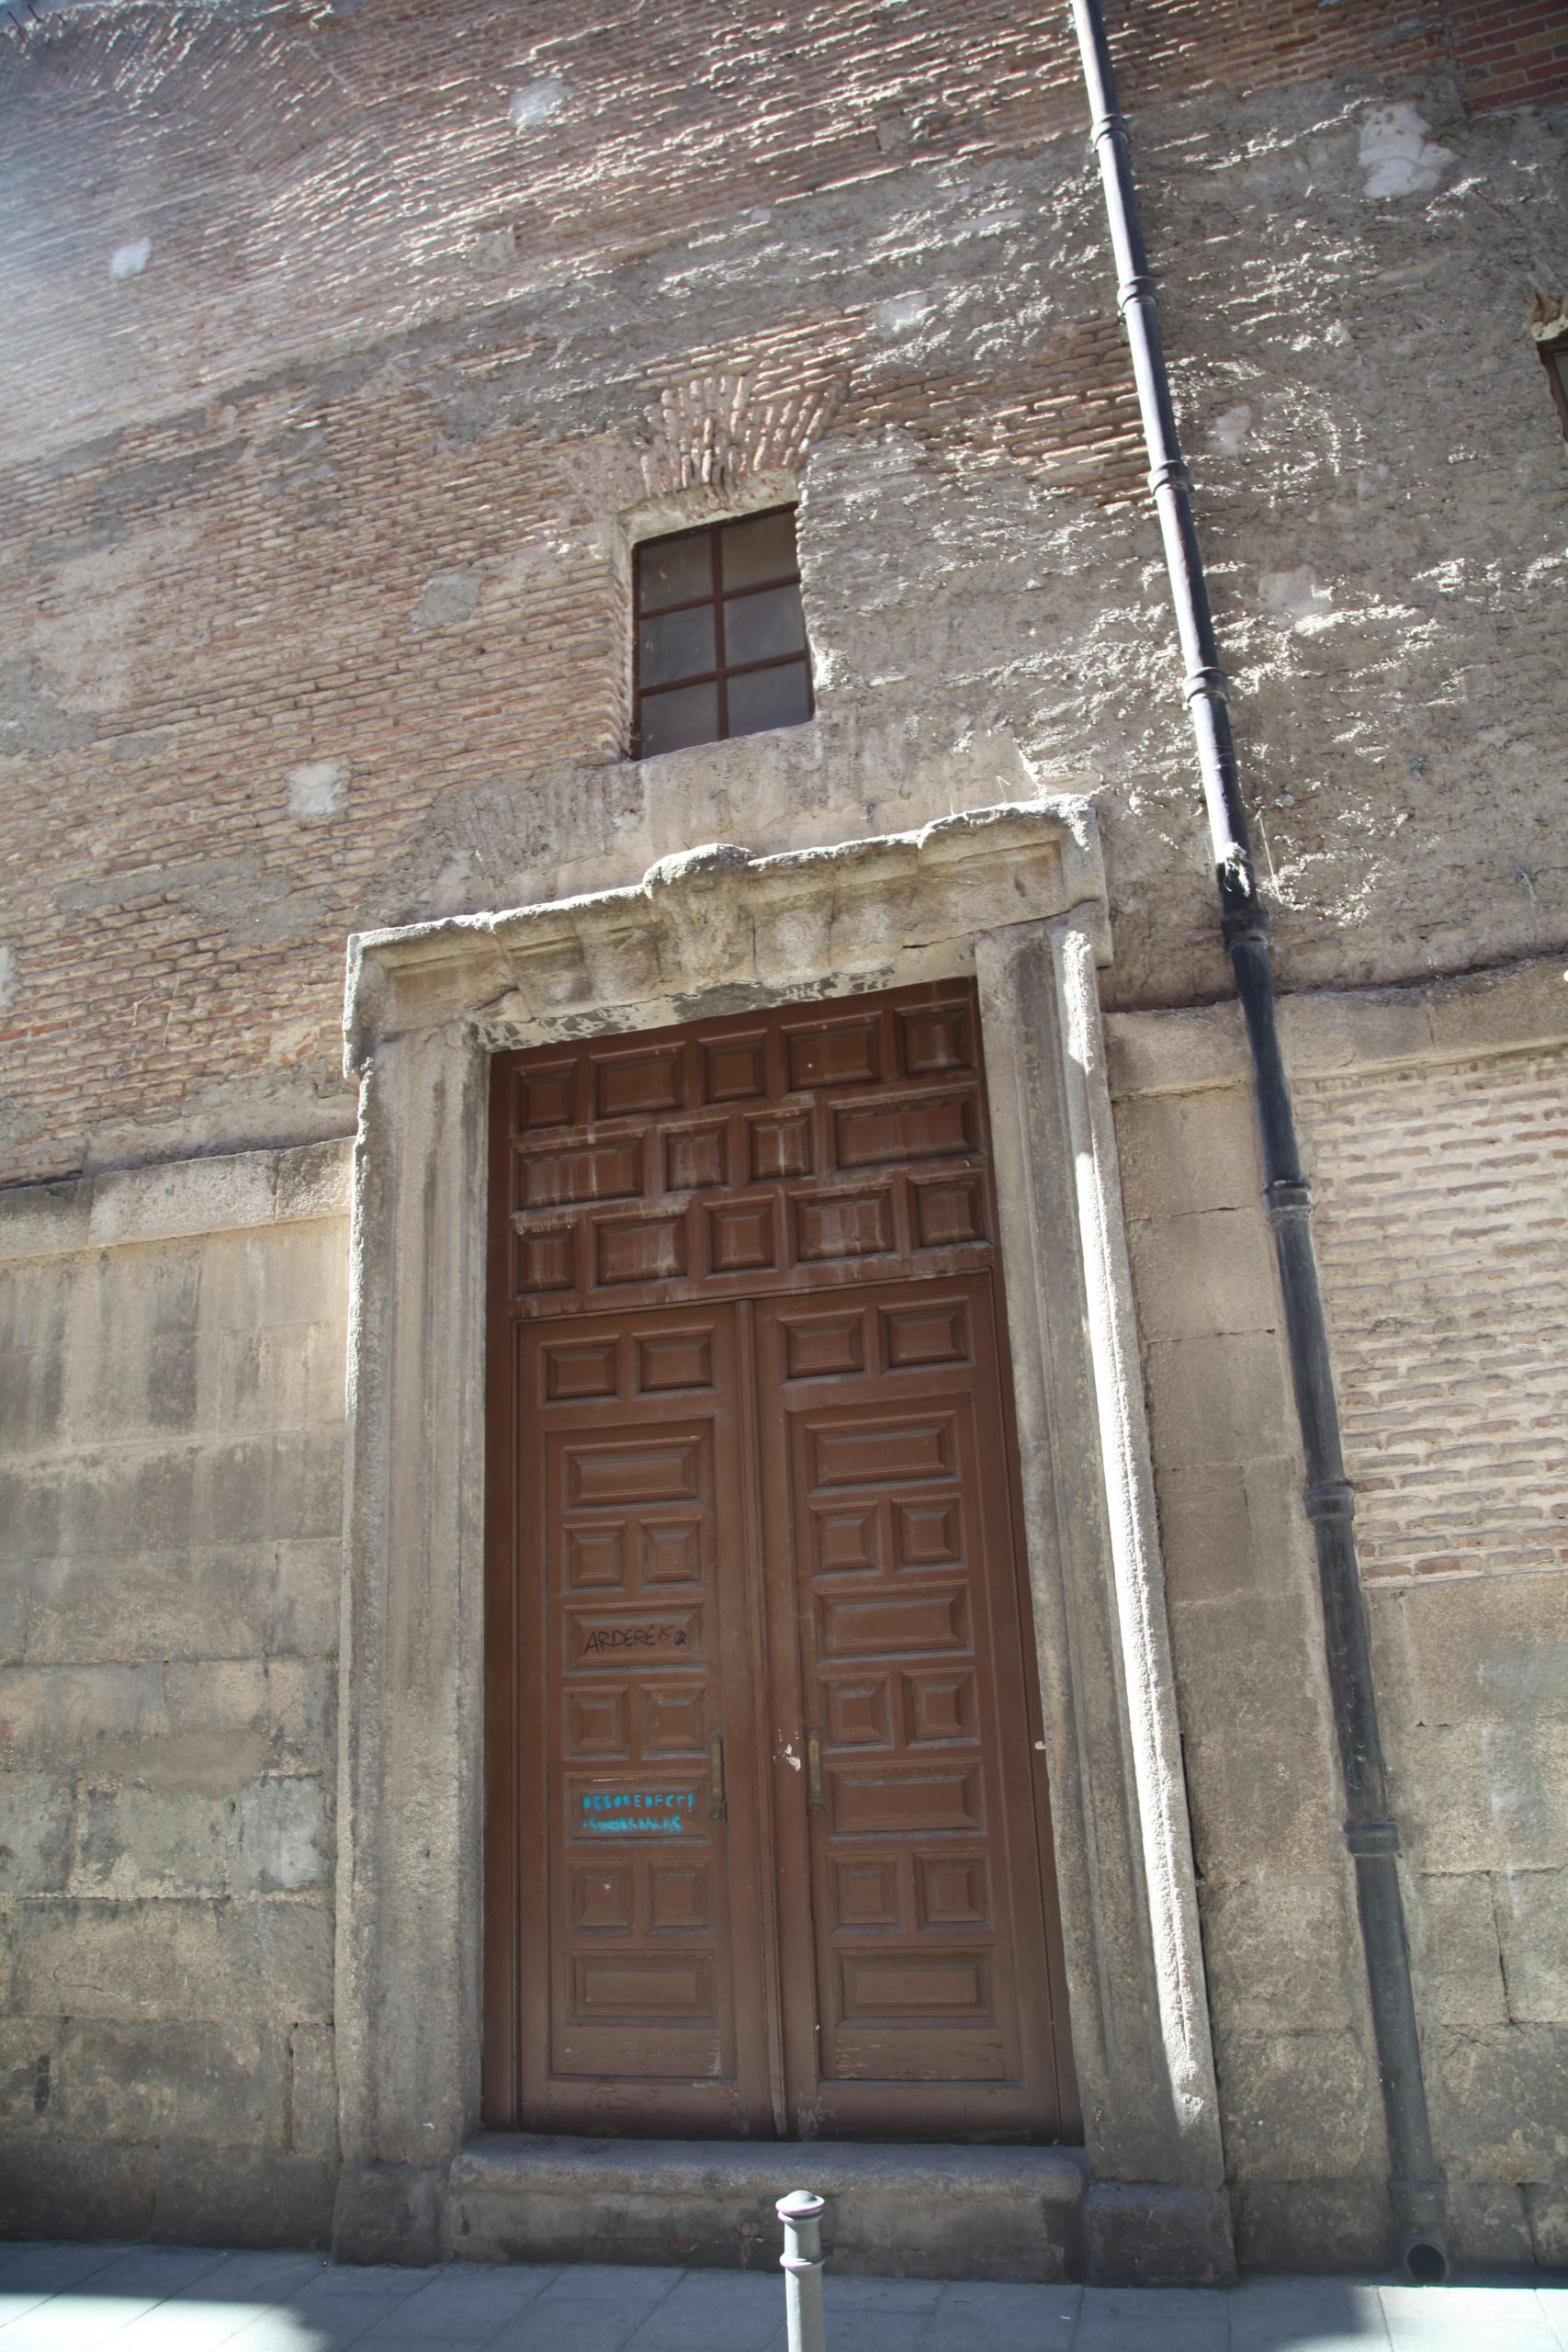 convento-detalle-puerta-IMG_2967